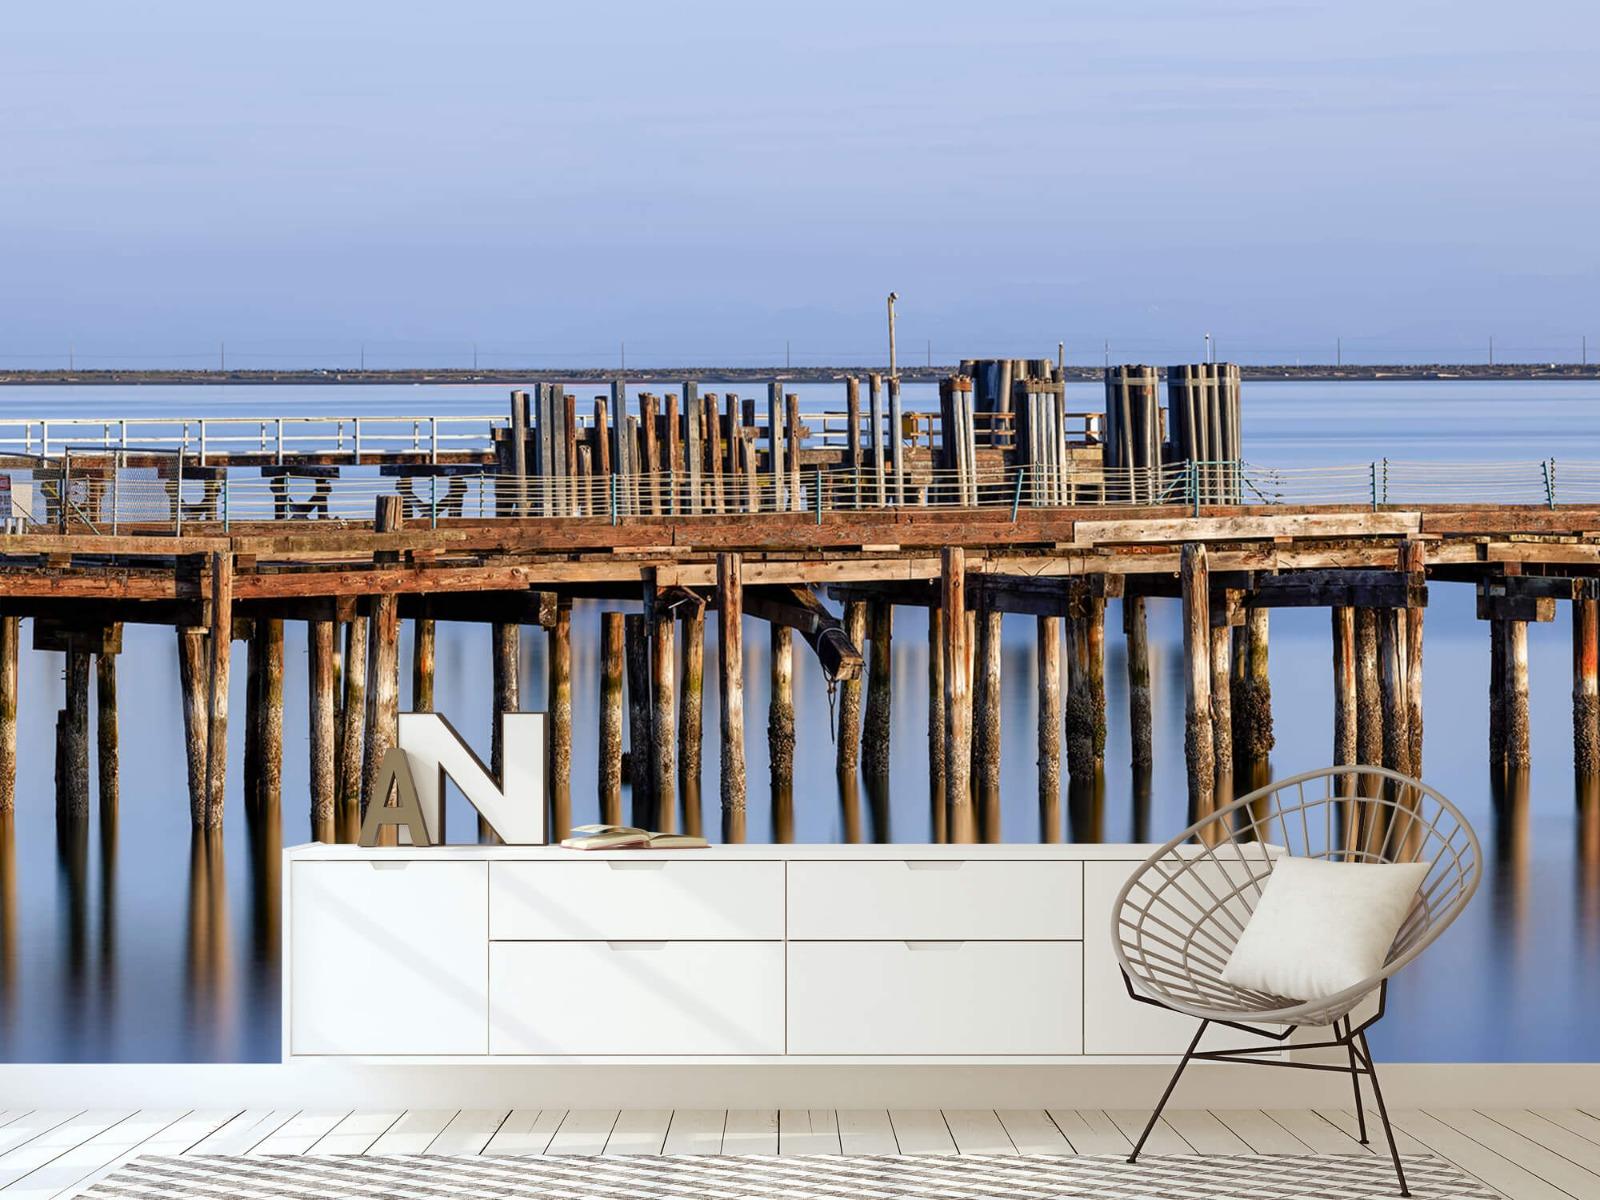 Houten Steigers - Steiger op houten palen - Wallexclusive - Slaapkamer 23